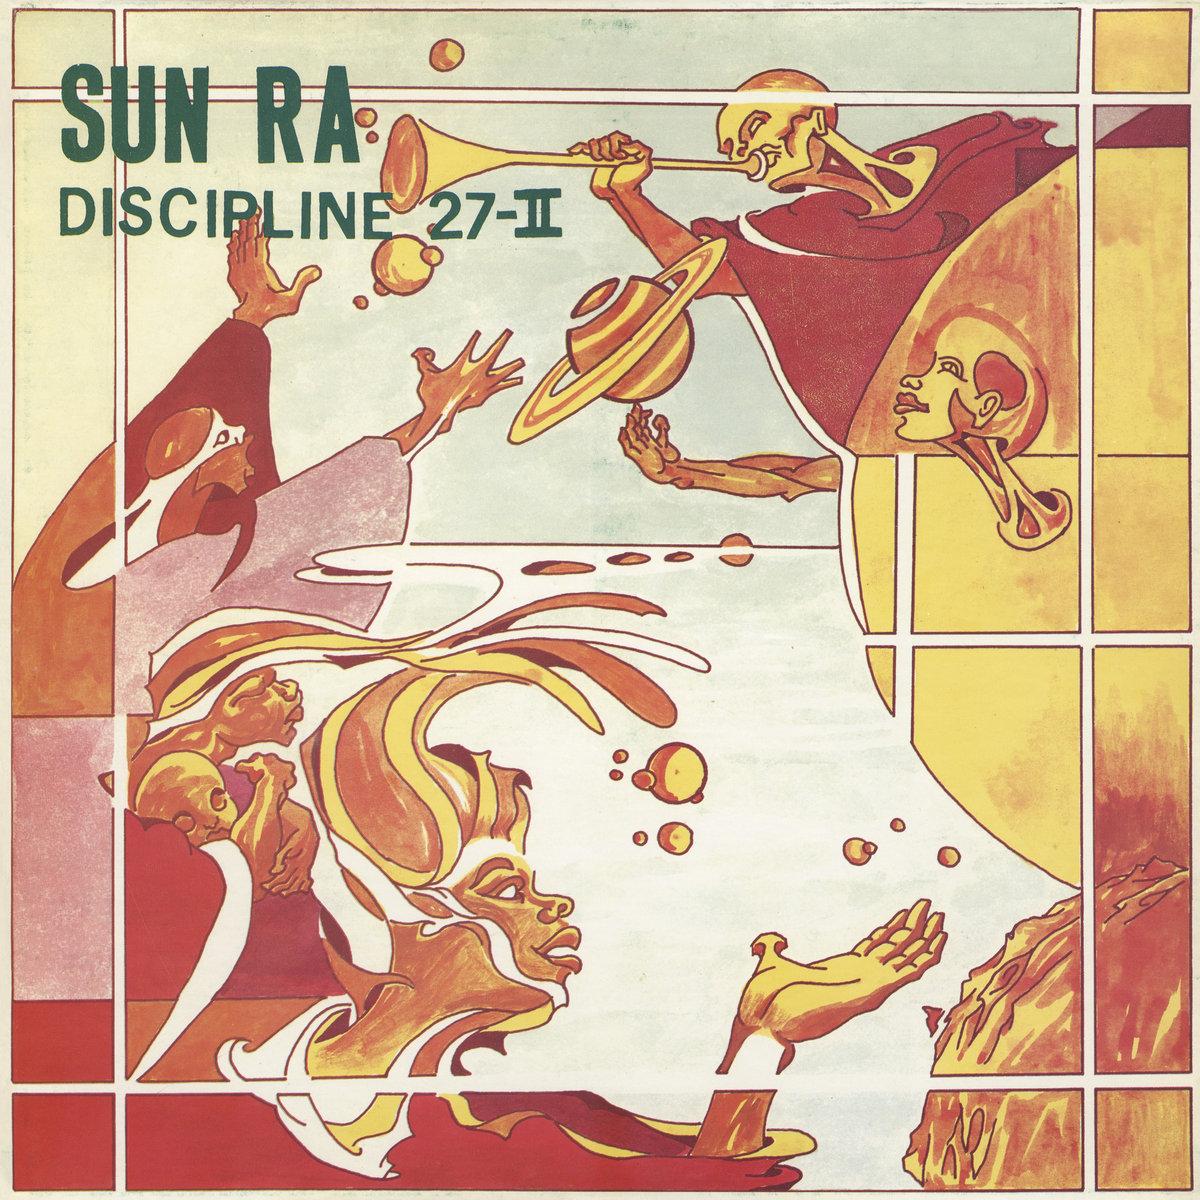 SUN RA - DISCPLINE 27-II